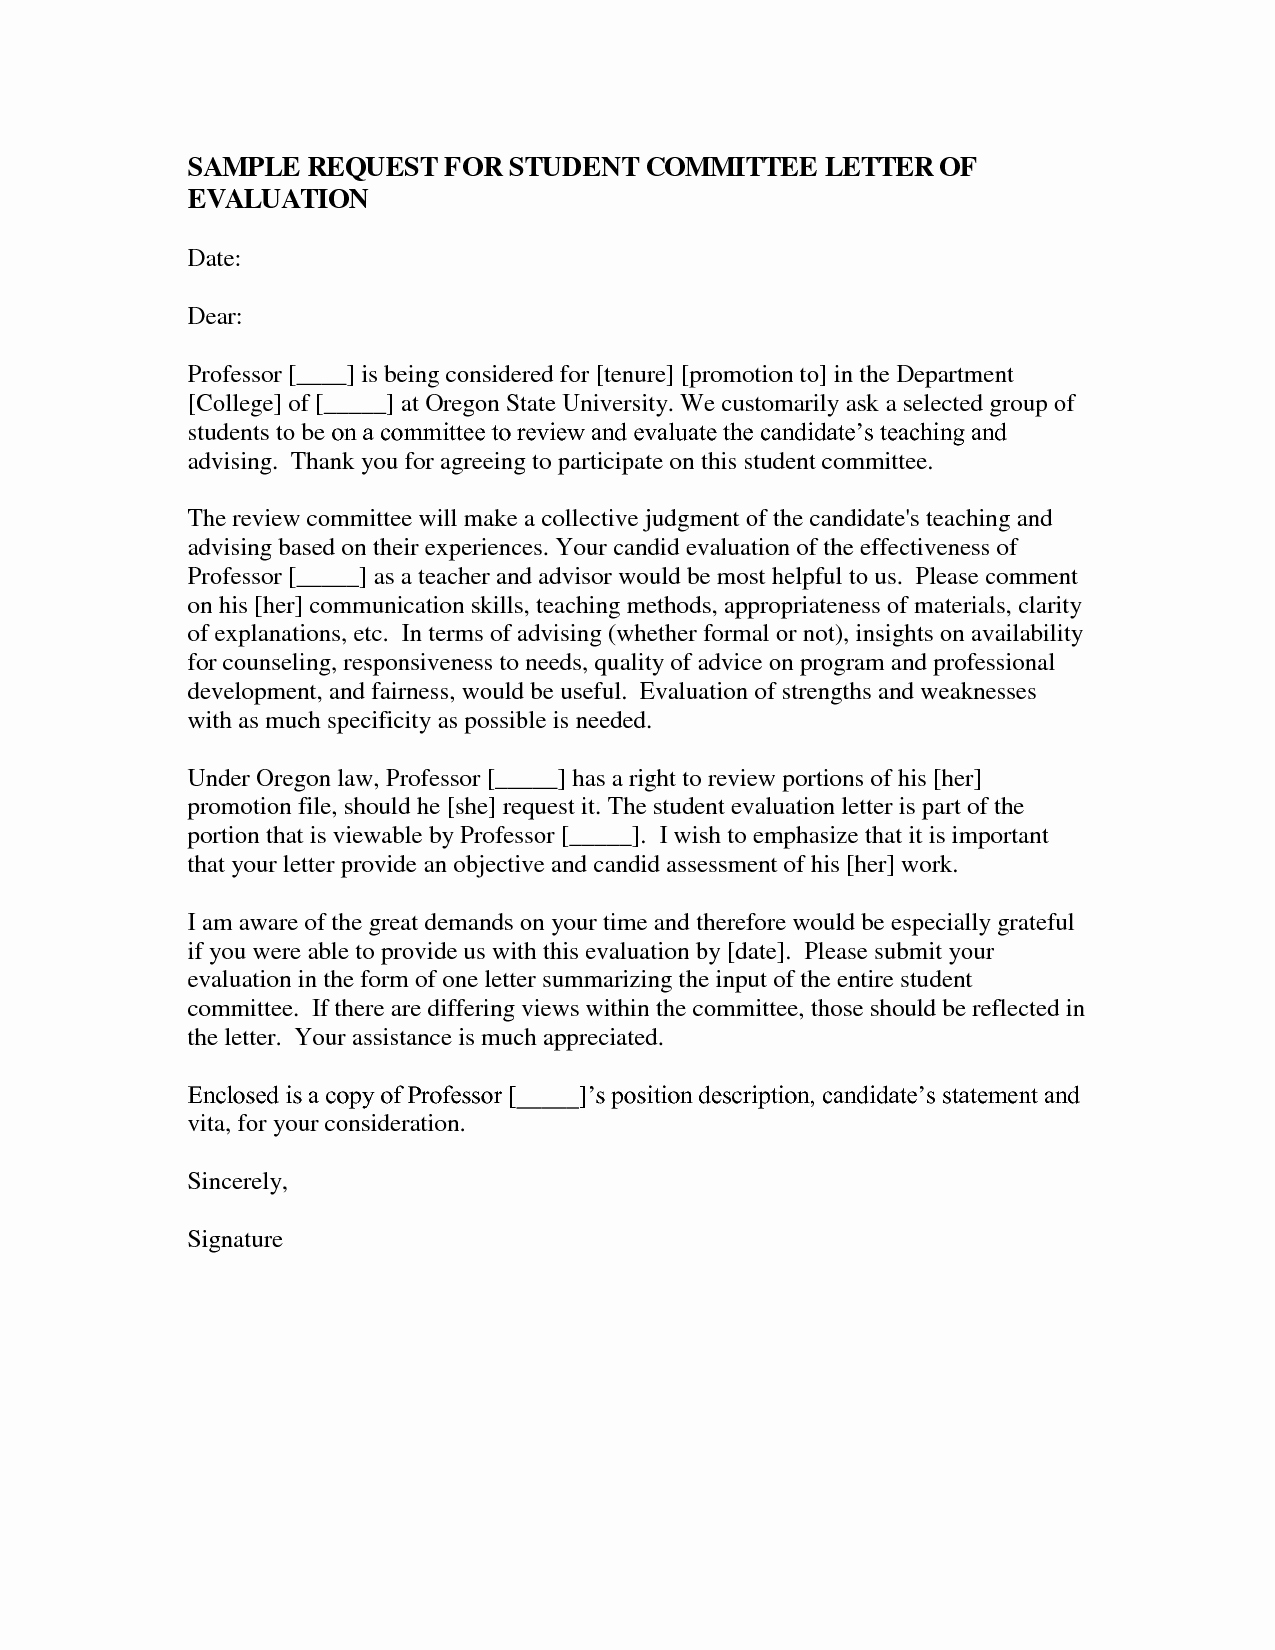 Recommendation Letter for Professor Promotion Unique Promotion Re Mendation Letter Sample Ideasplataforma